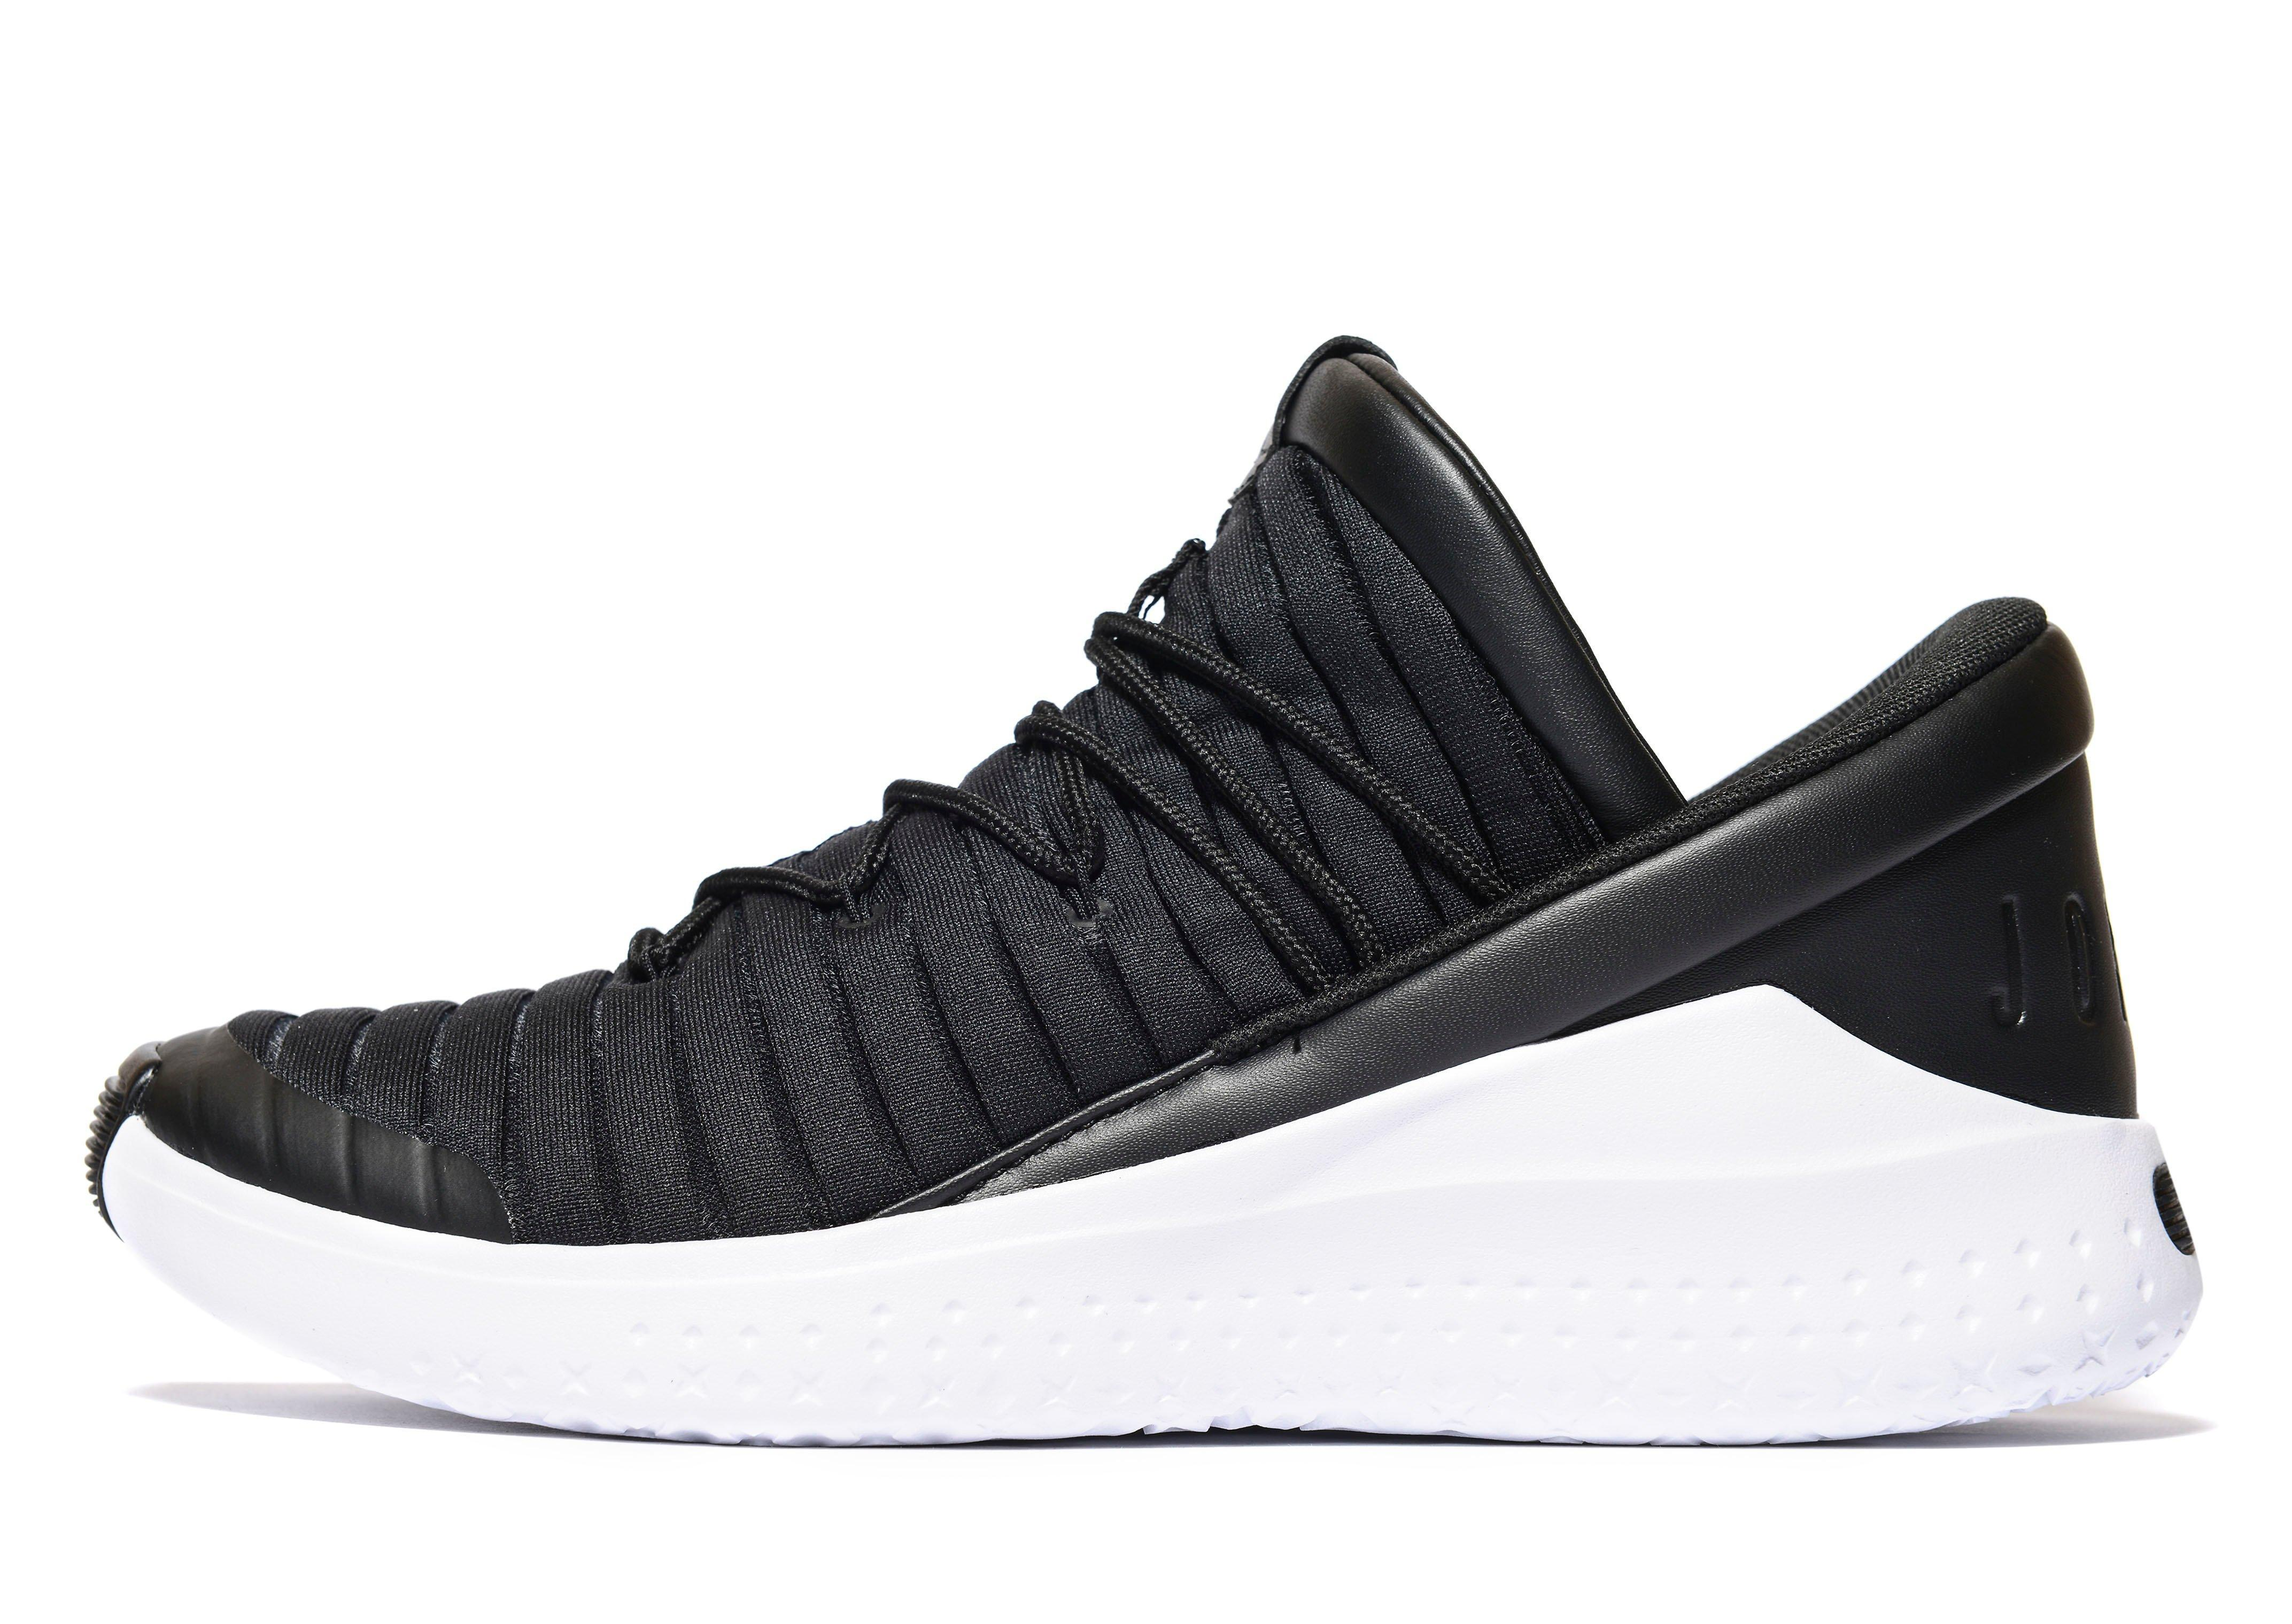 d1cee96f43fbe Nike Air Jordan Flight Flex in Black for Men - Lyst